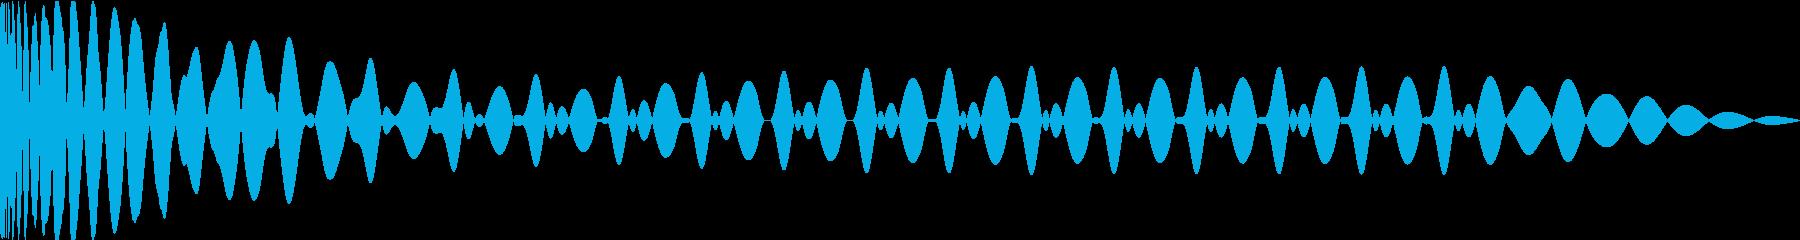 EDMキックEの再生済みの波形